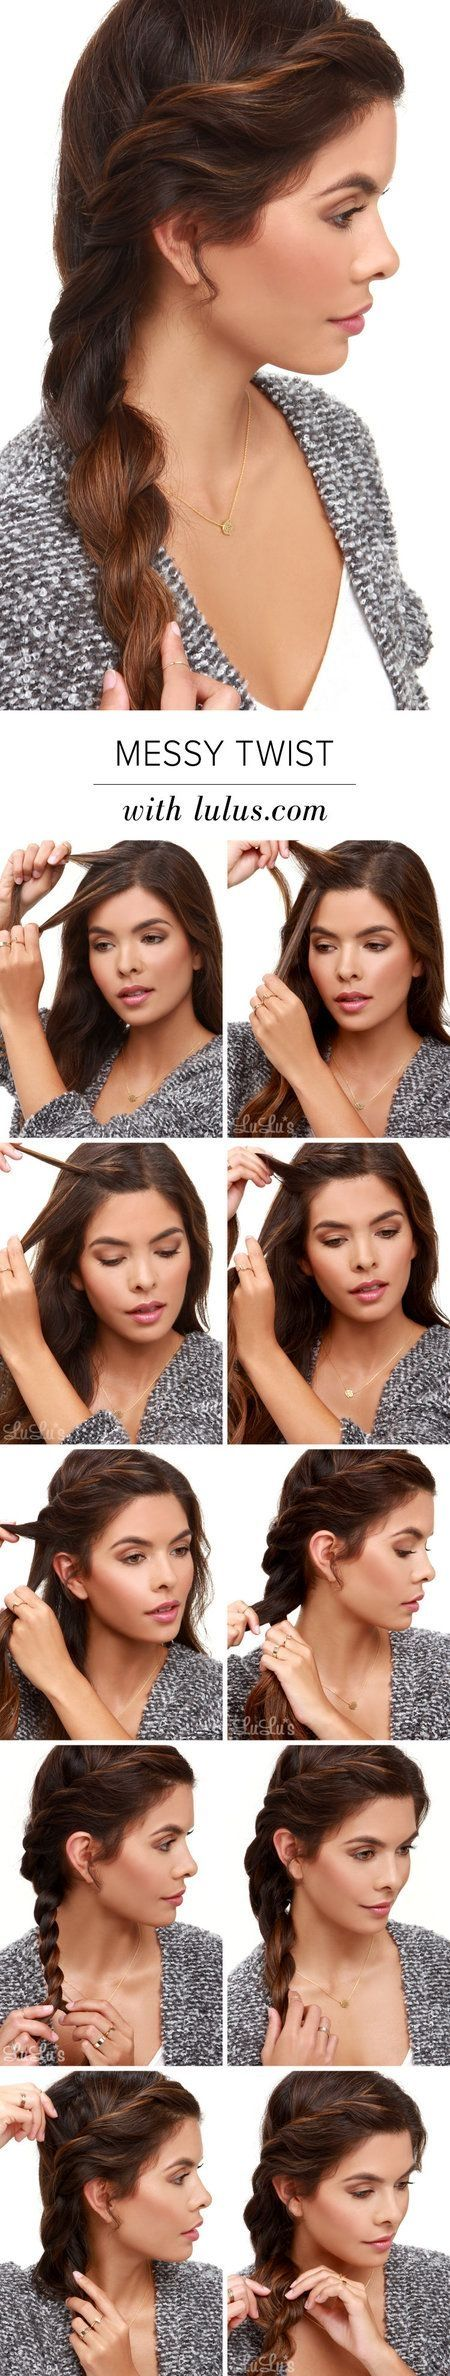 Messy Twist Braid #tutorial #lulus #braided #hairdo #hairstyle by isabel